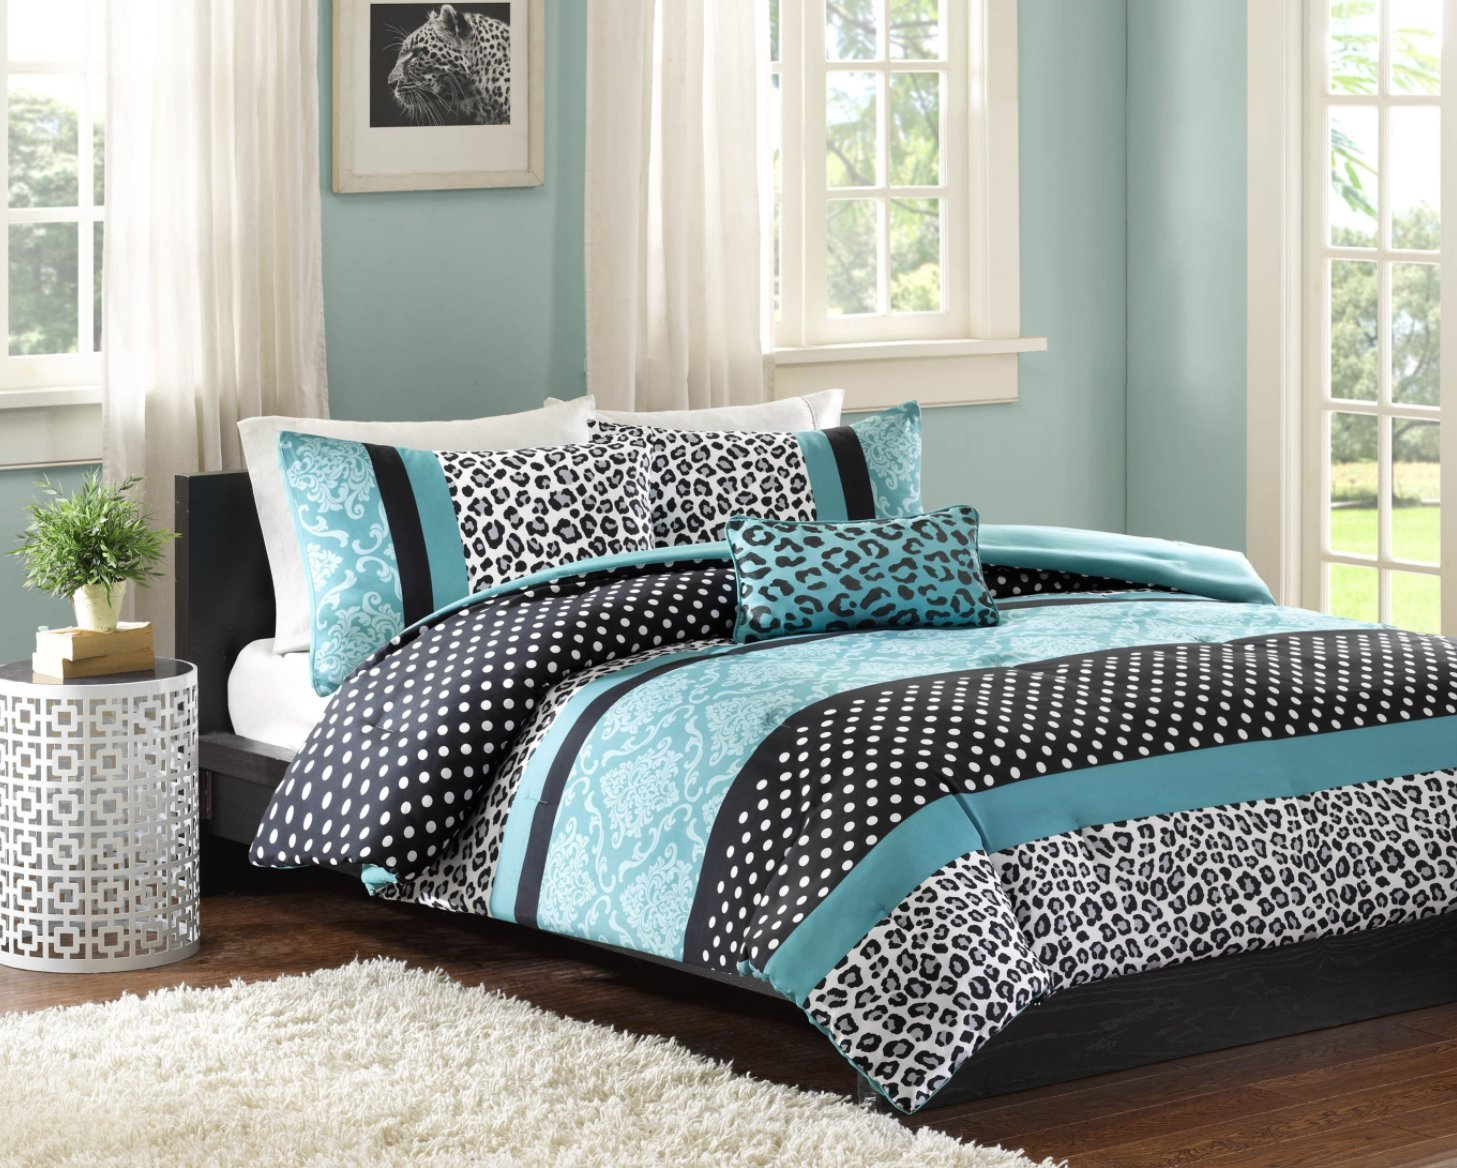 comforter bed set teen bedding modern teal black animal